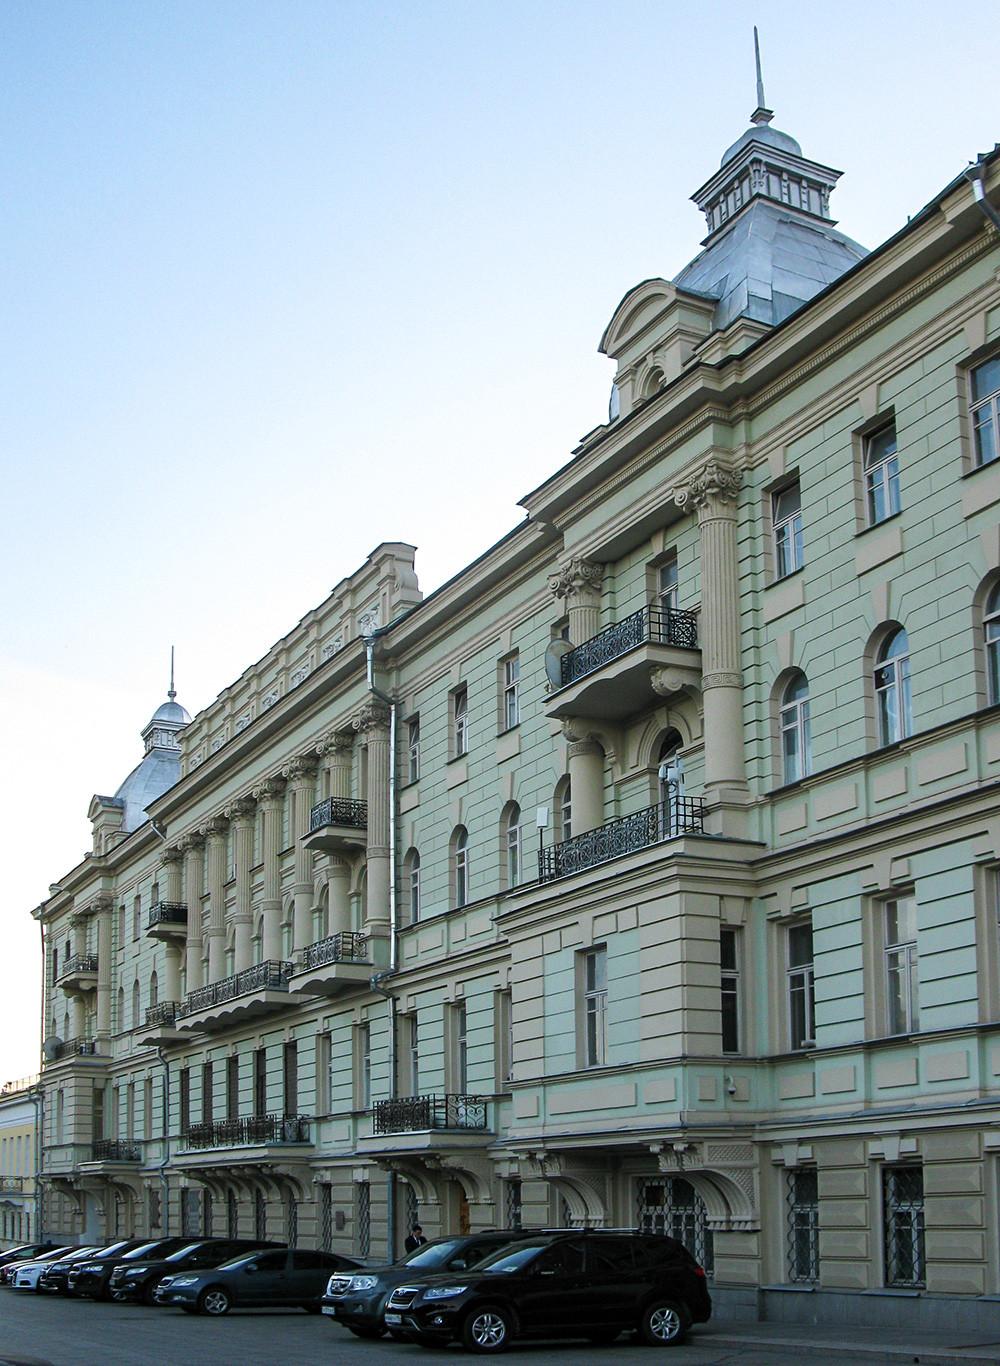 The house on Manezhnaya street, 9 – facing the Kremlin wall. Here, Anna Ulyanova lived until her death in 1935.